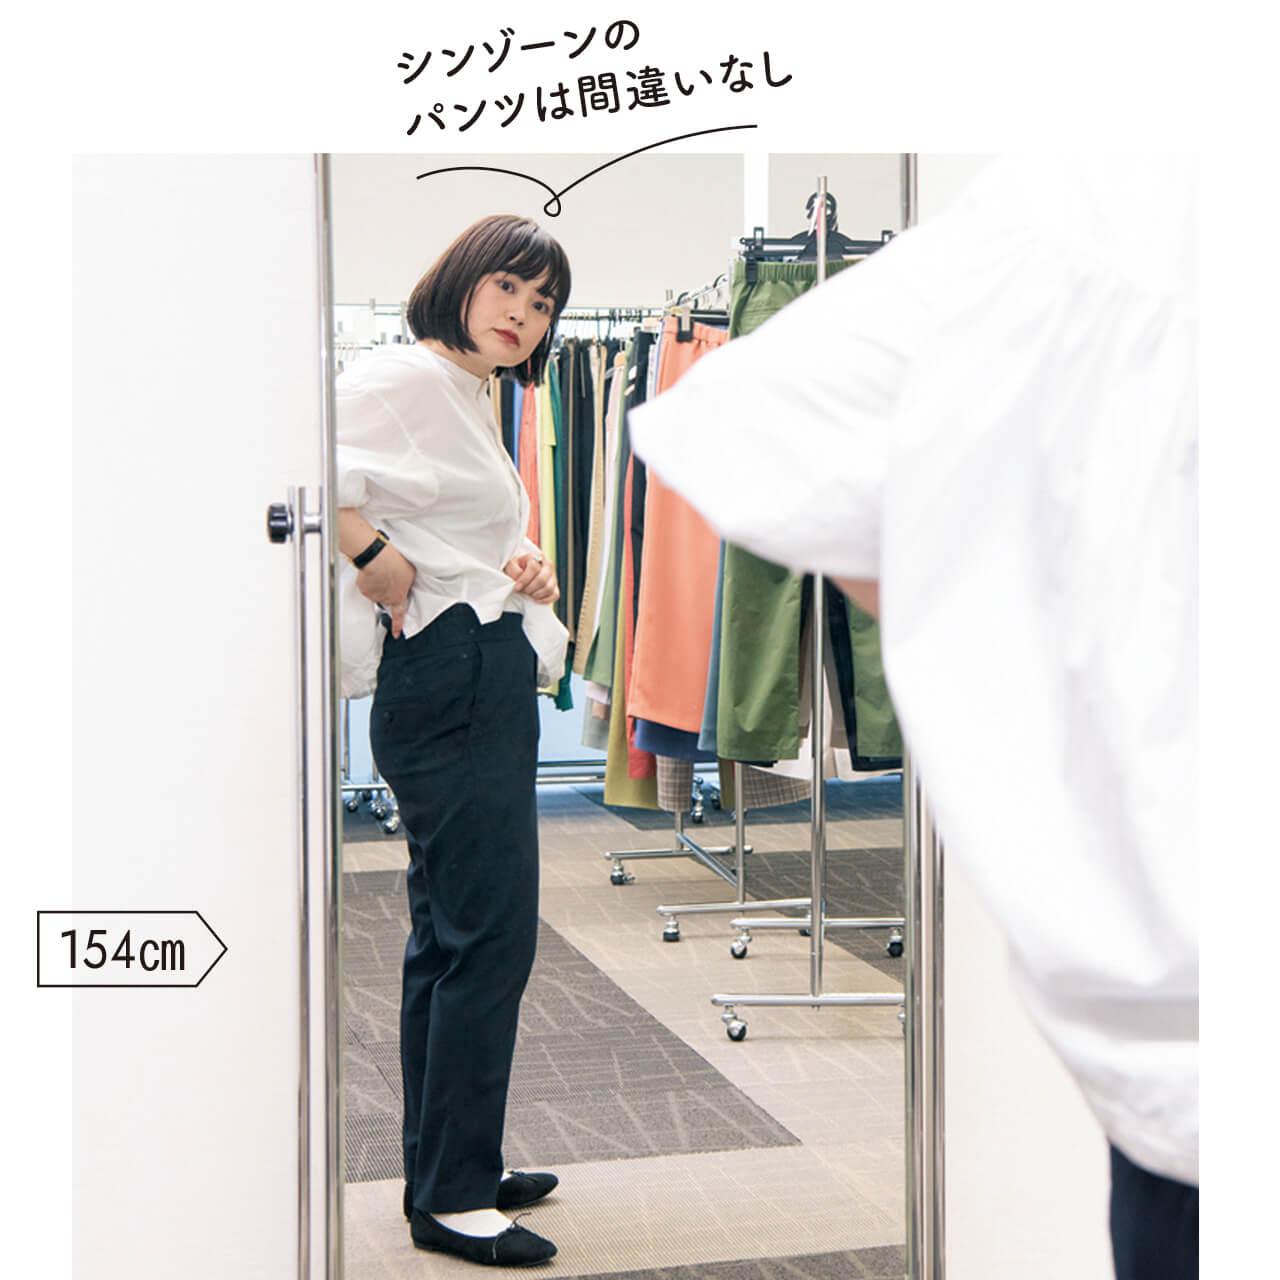 154cm 編集ボブッコ 「シンゾーンのパンツは間違いなし」